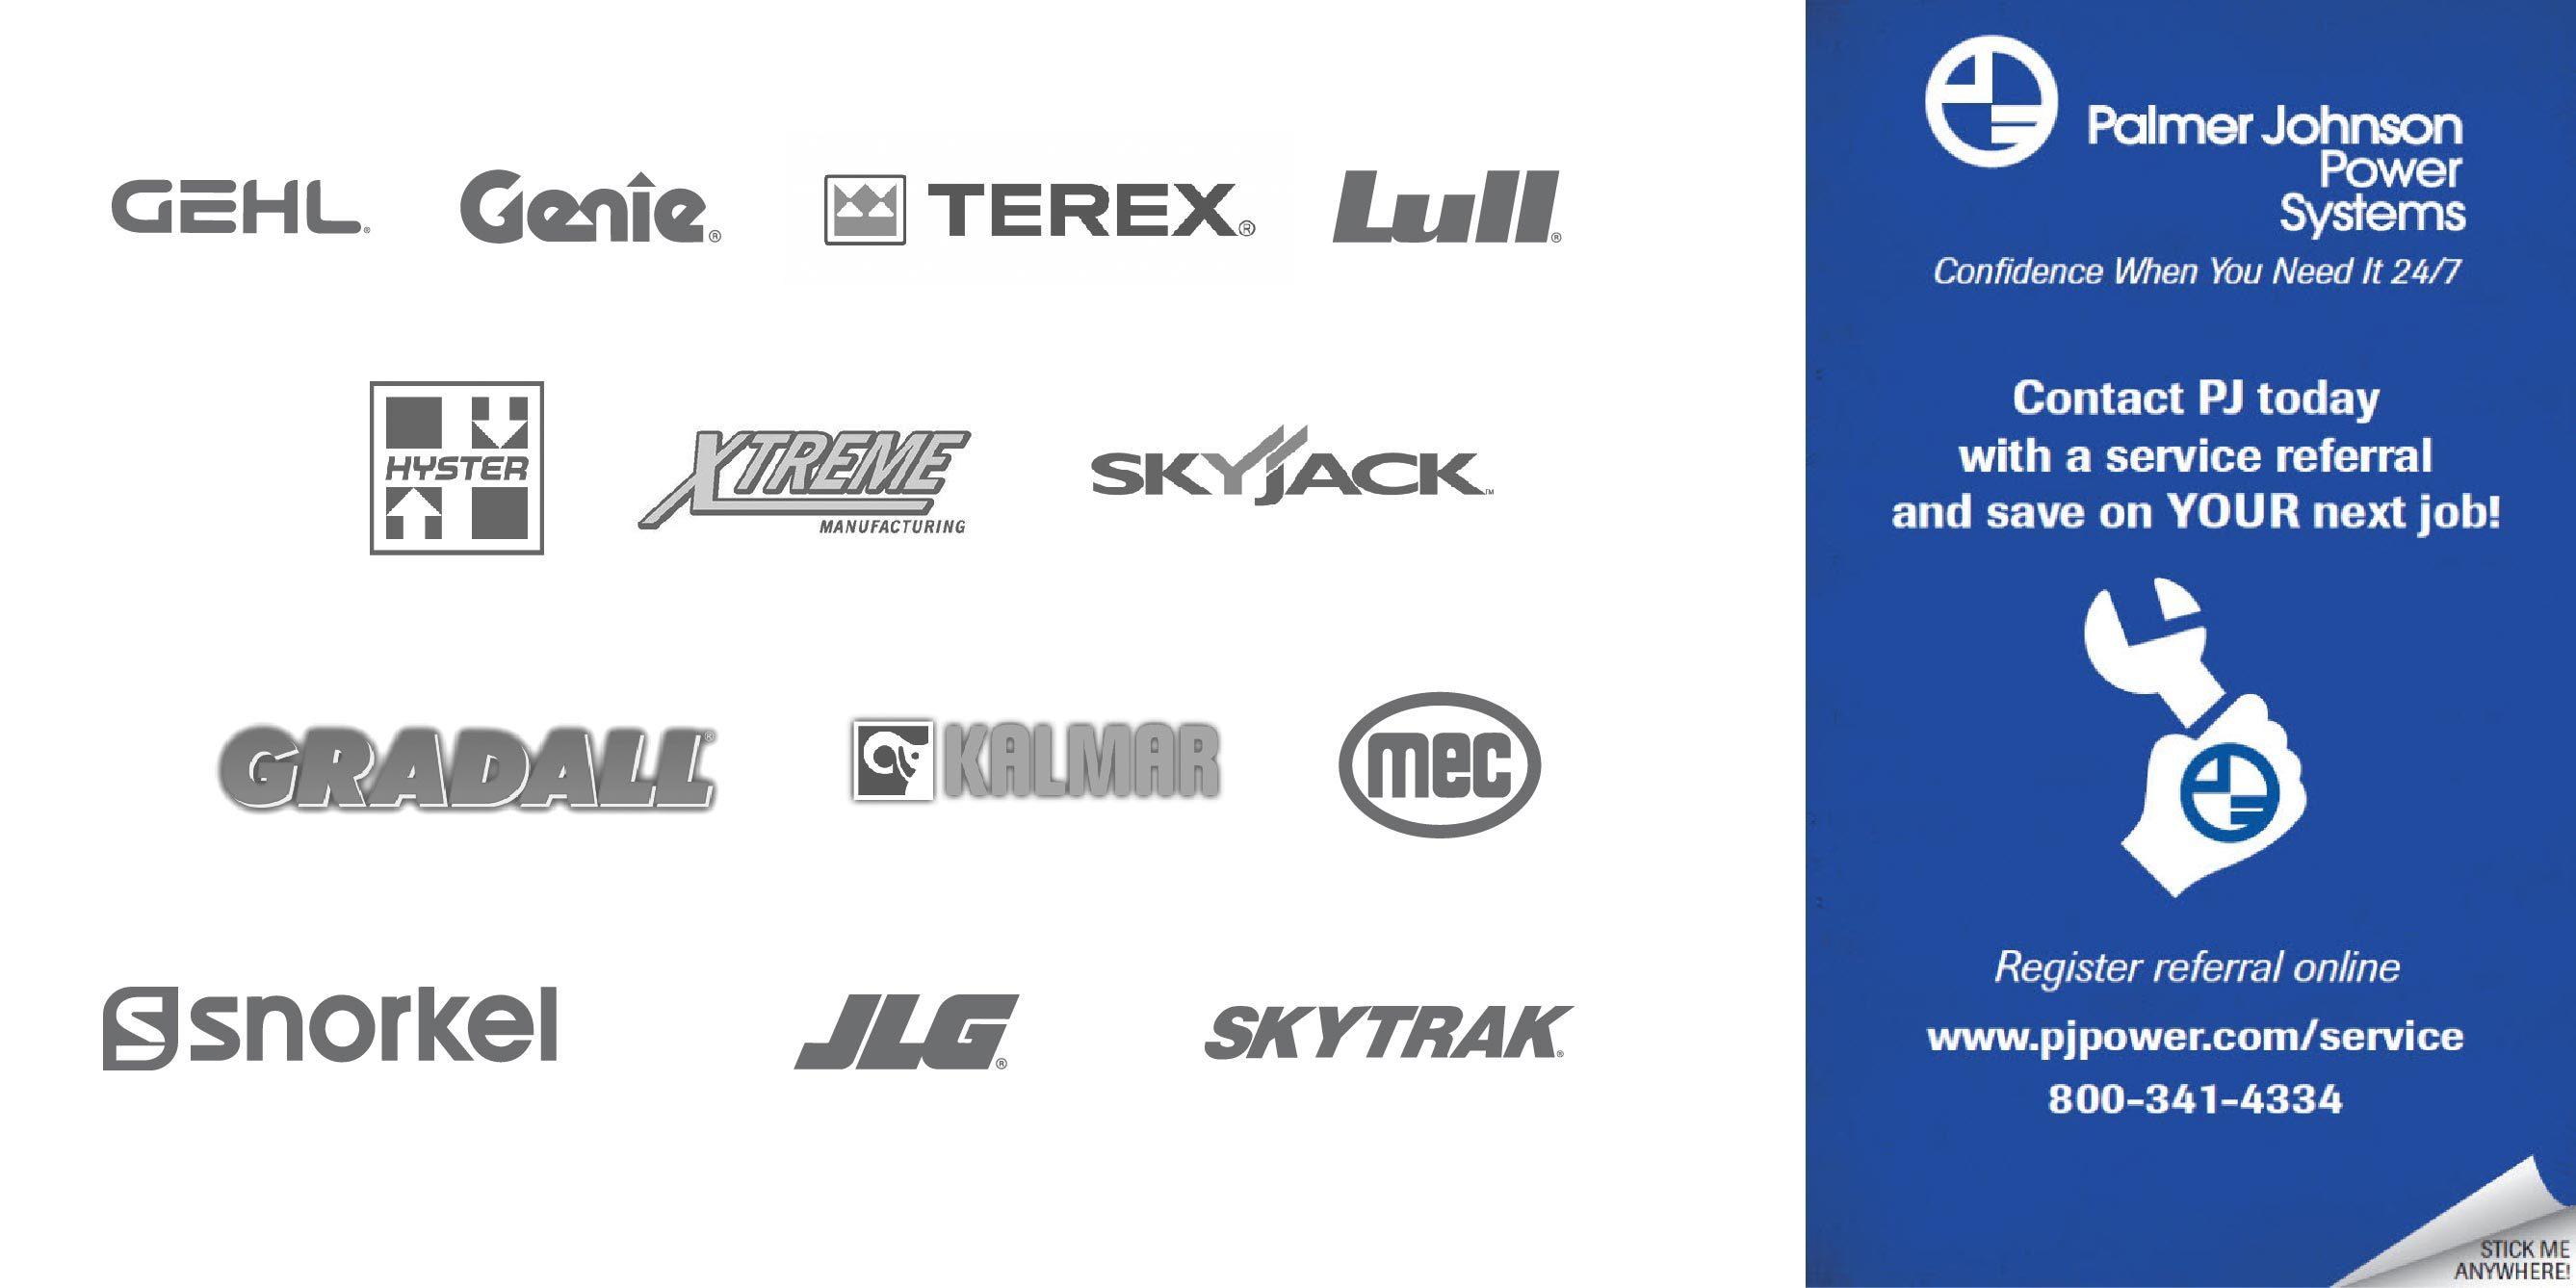 JLG,  Lull,  Skytrak,  SkyJack,  Gradall,  Terex/ Genie,  Xtreme,  Snorkel,  MEC,  Harlo,  Kalmar,  Hyster